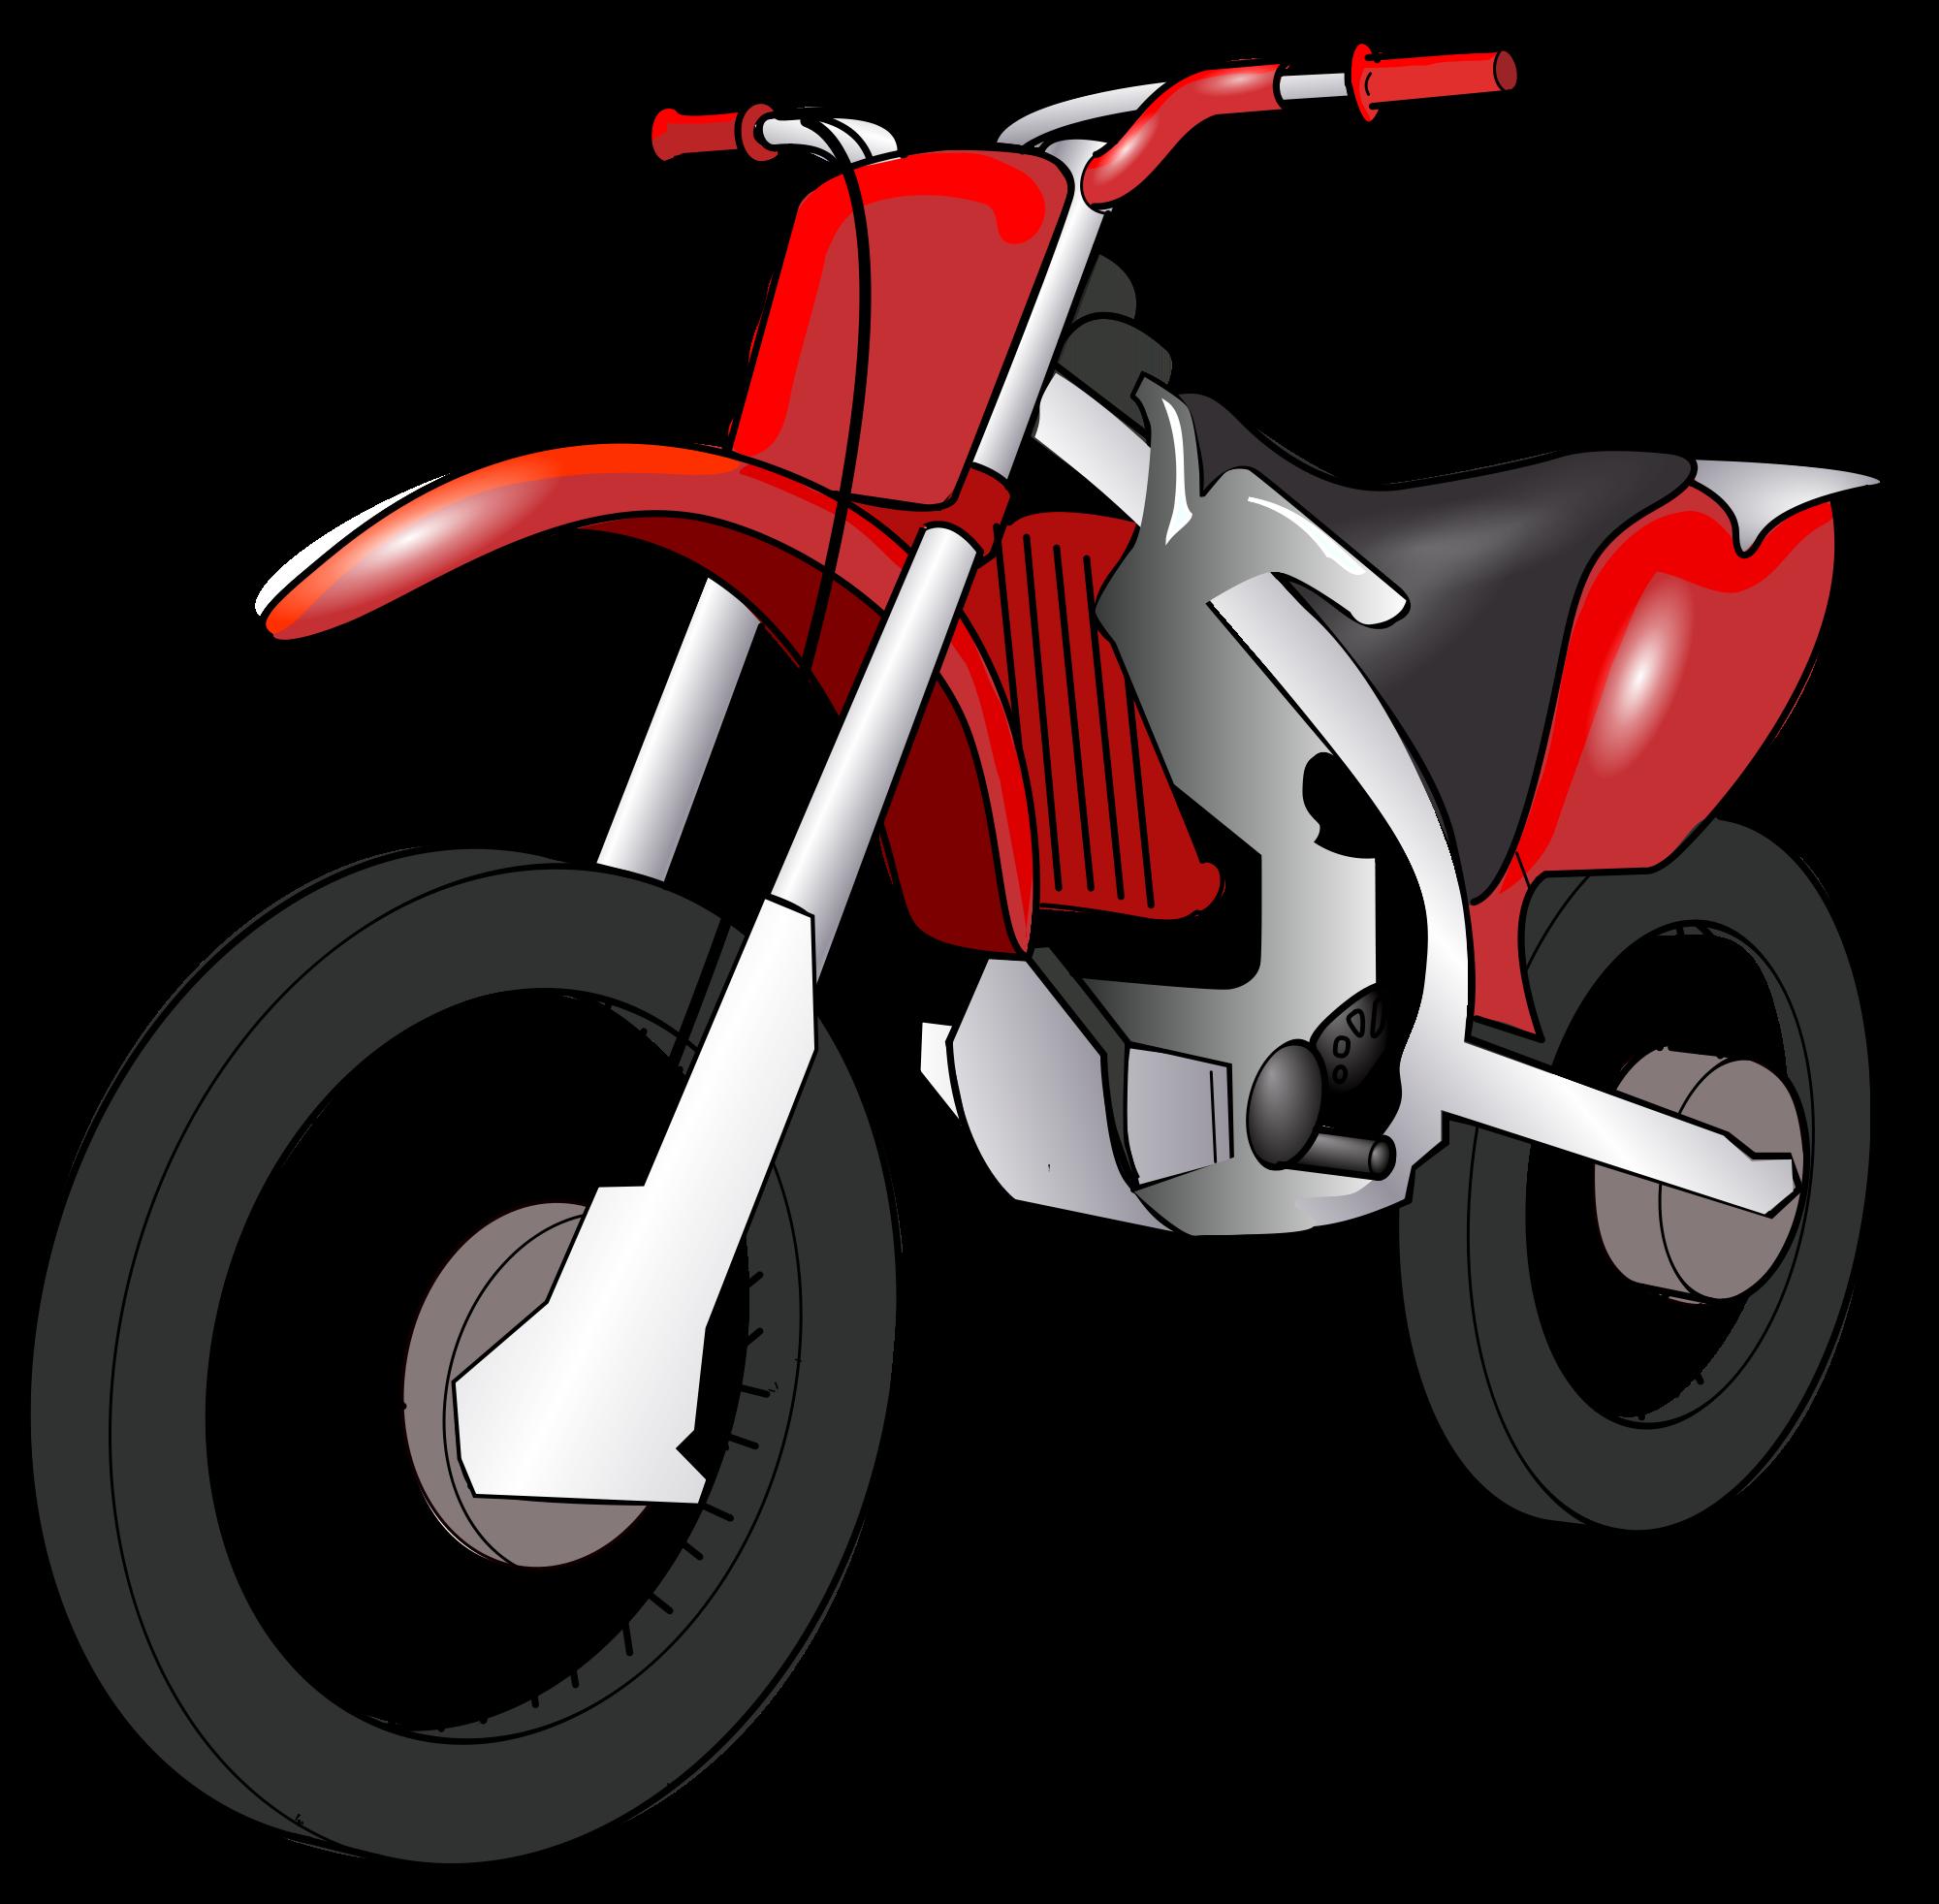 Dirt Bike Png Free Transparent Dirt Bikepng Images Pluspng